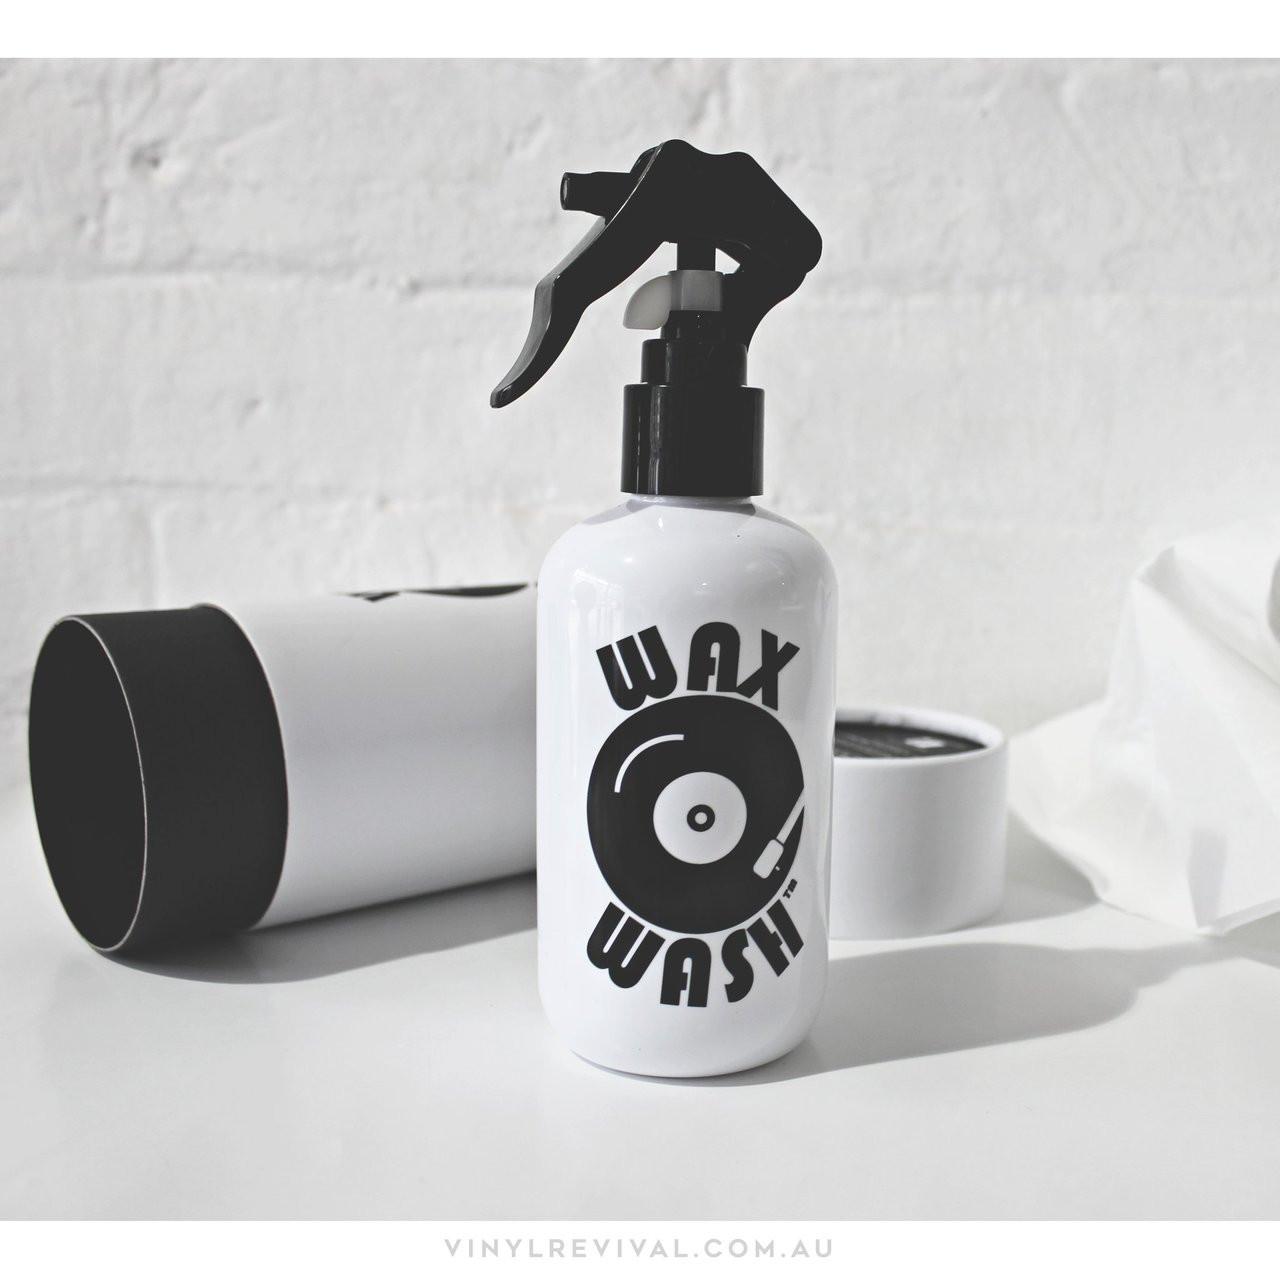 Wax Wash Original Record Cleaner